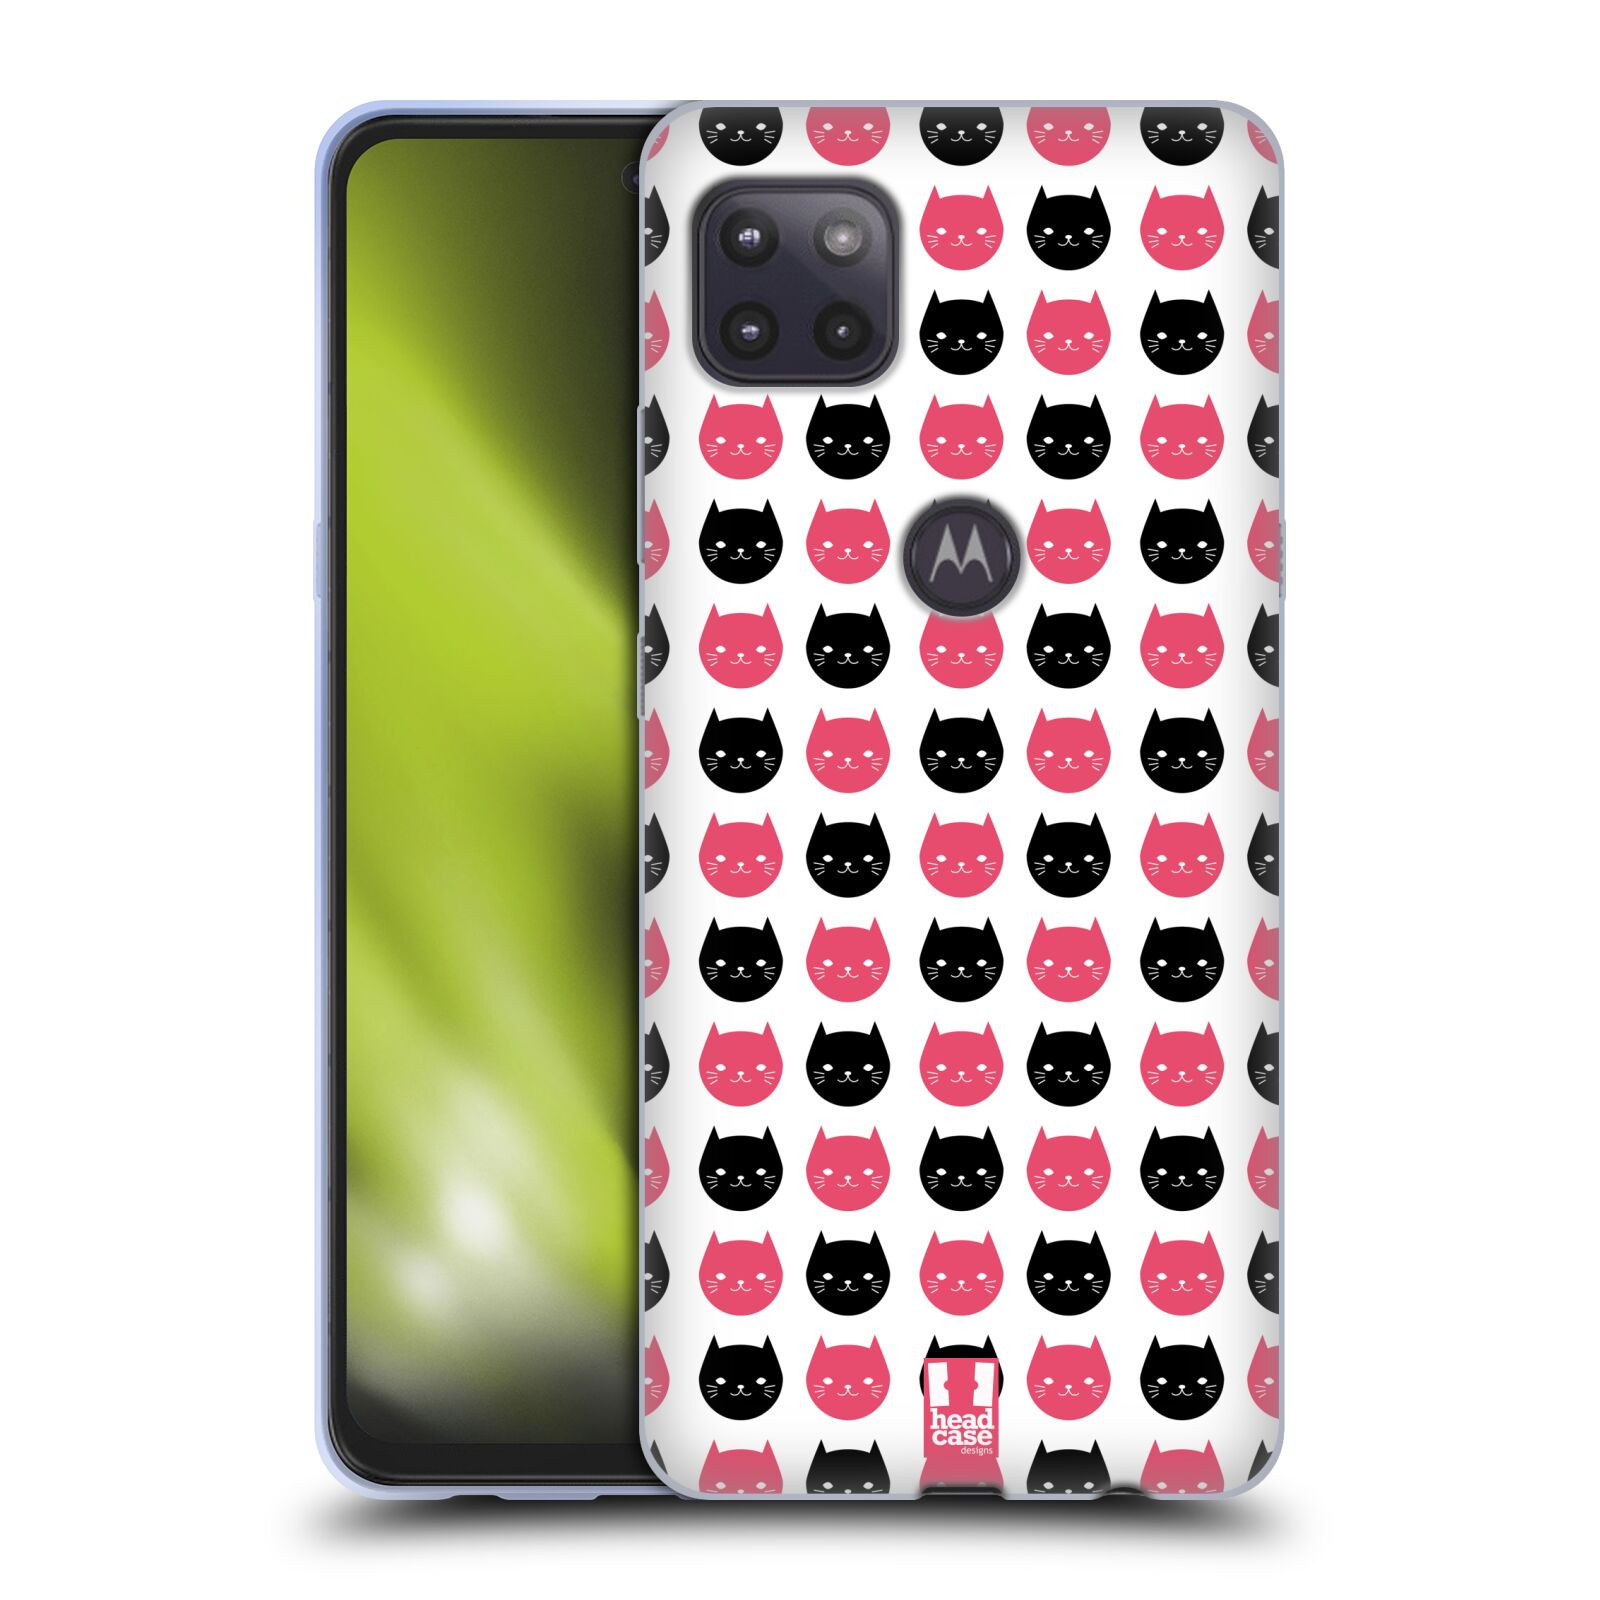 Silikonové pouzdro na mobil Motorola Moto G 5G - Head Case - KOČKY Black and Pink